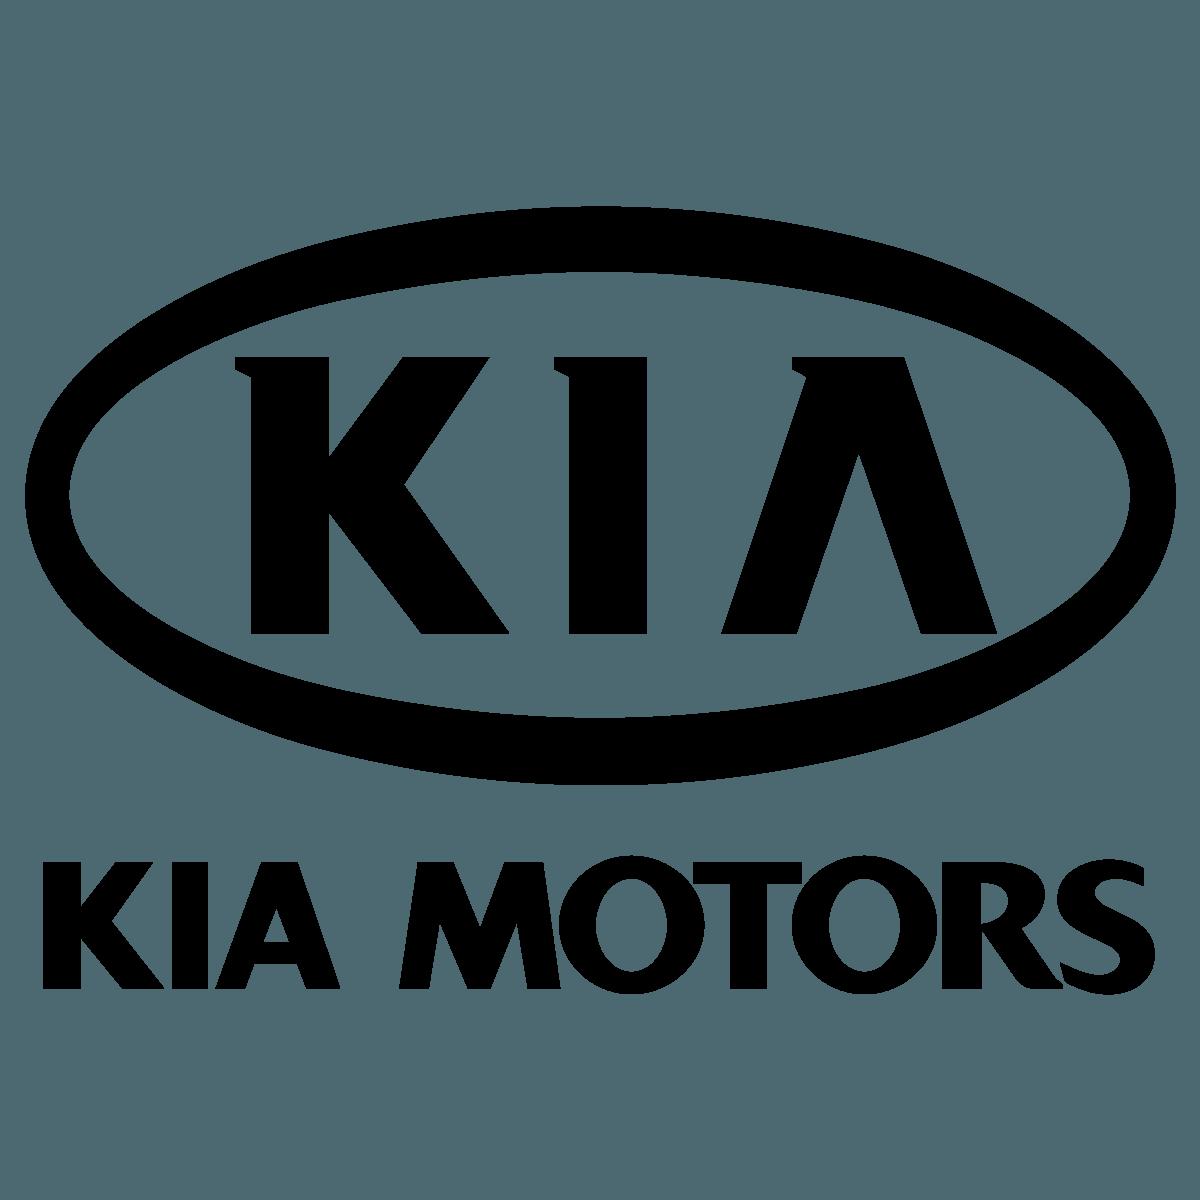 Kia Logo Wallpapers